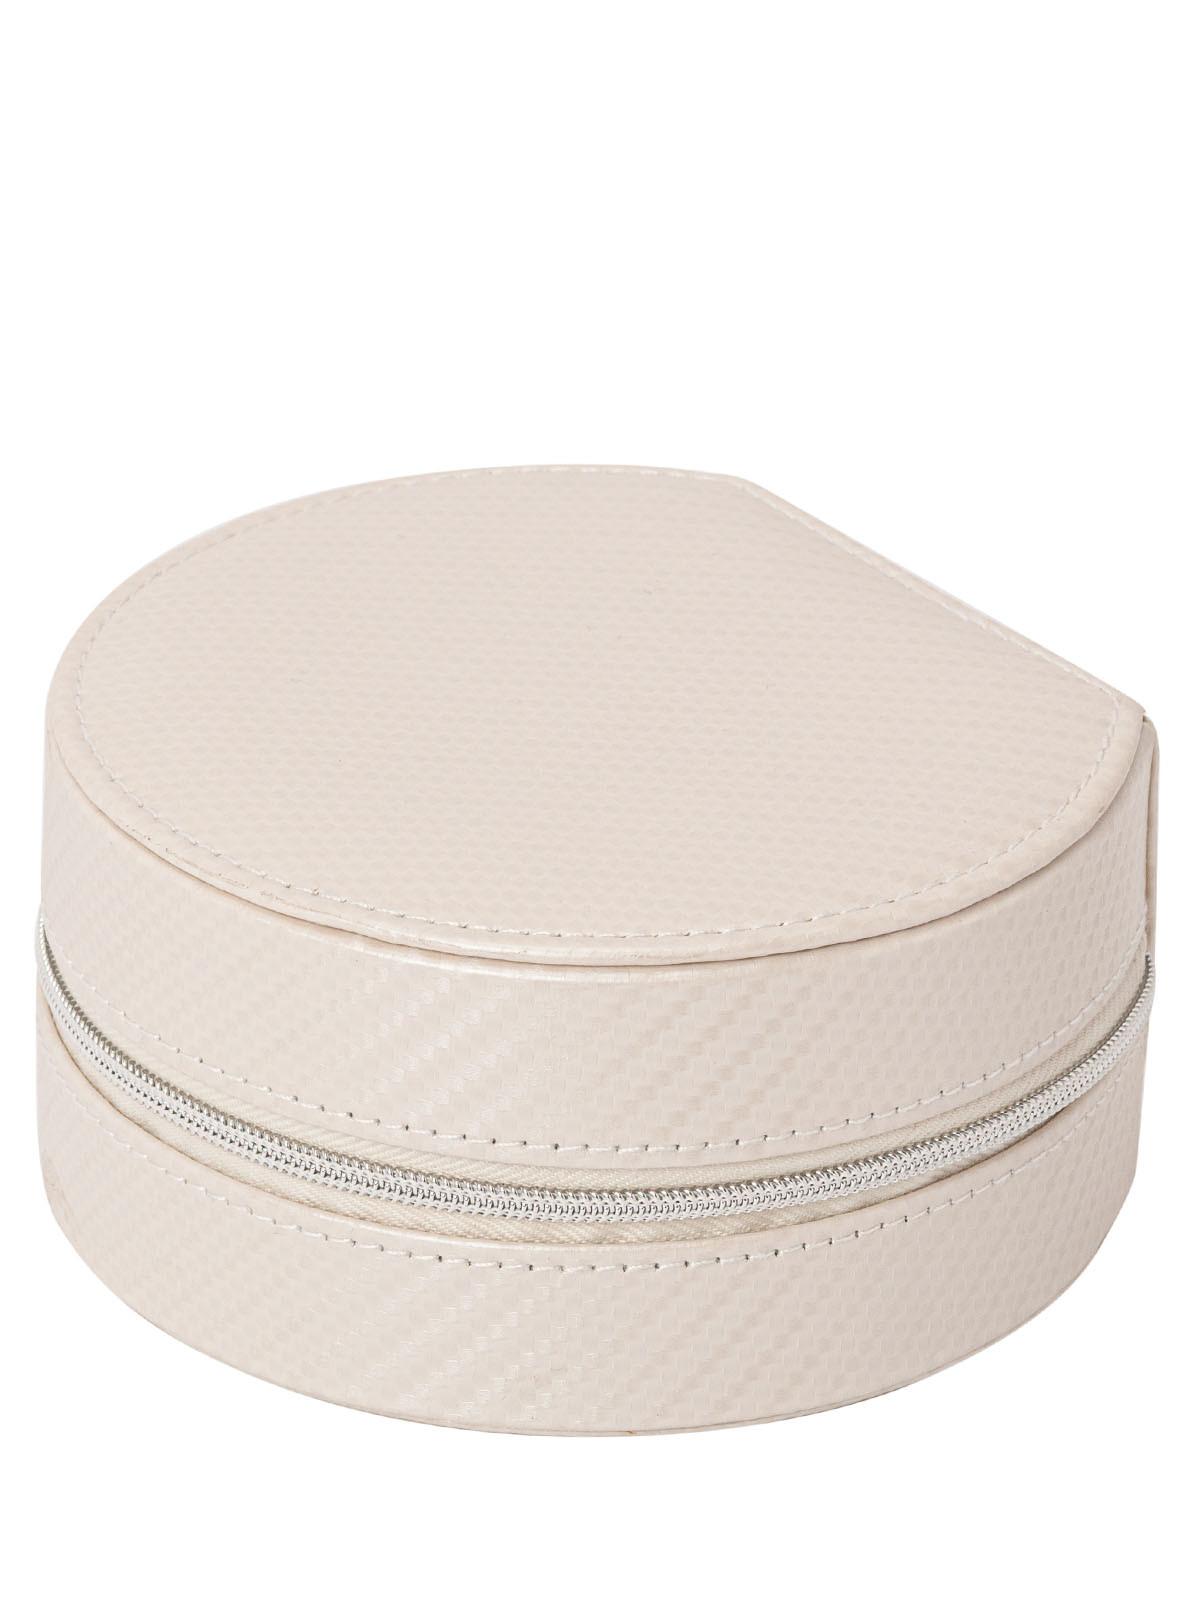 Шкатулка для украшений S-654-W белый